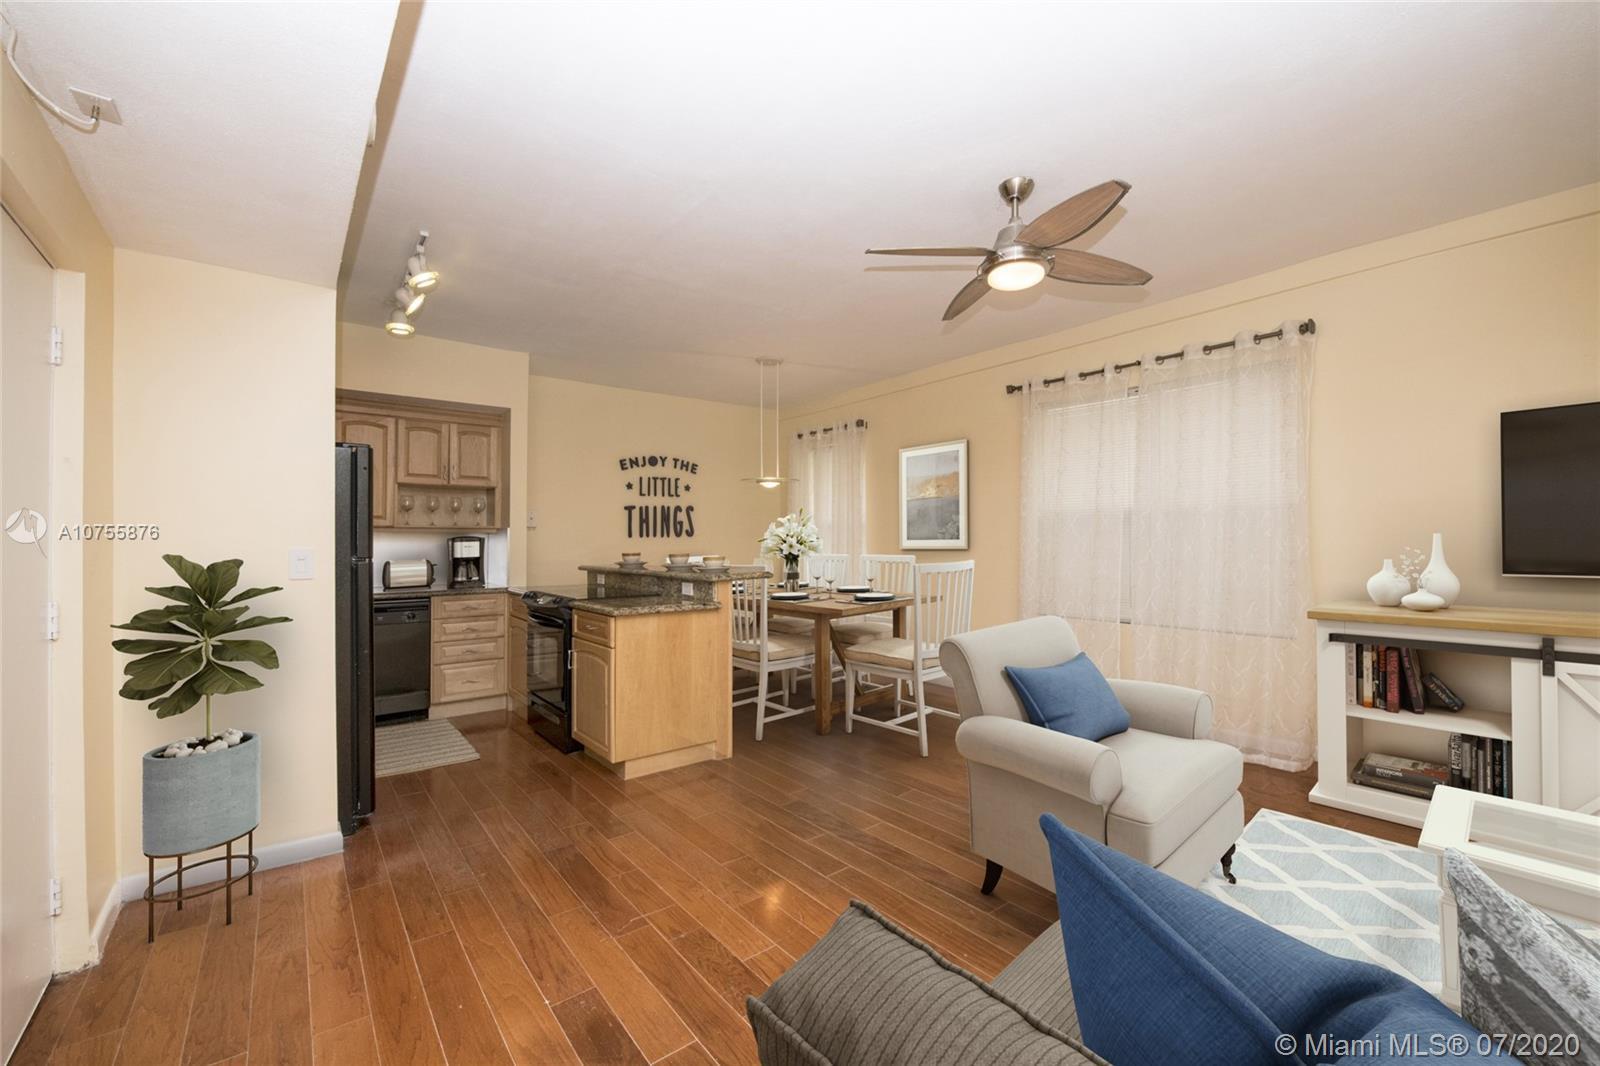 1218 Drexel Ave #205, Miami Beach, FL 33139 - Miami Beach, FL real estate listing